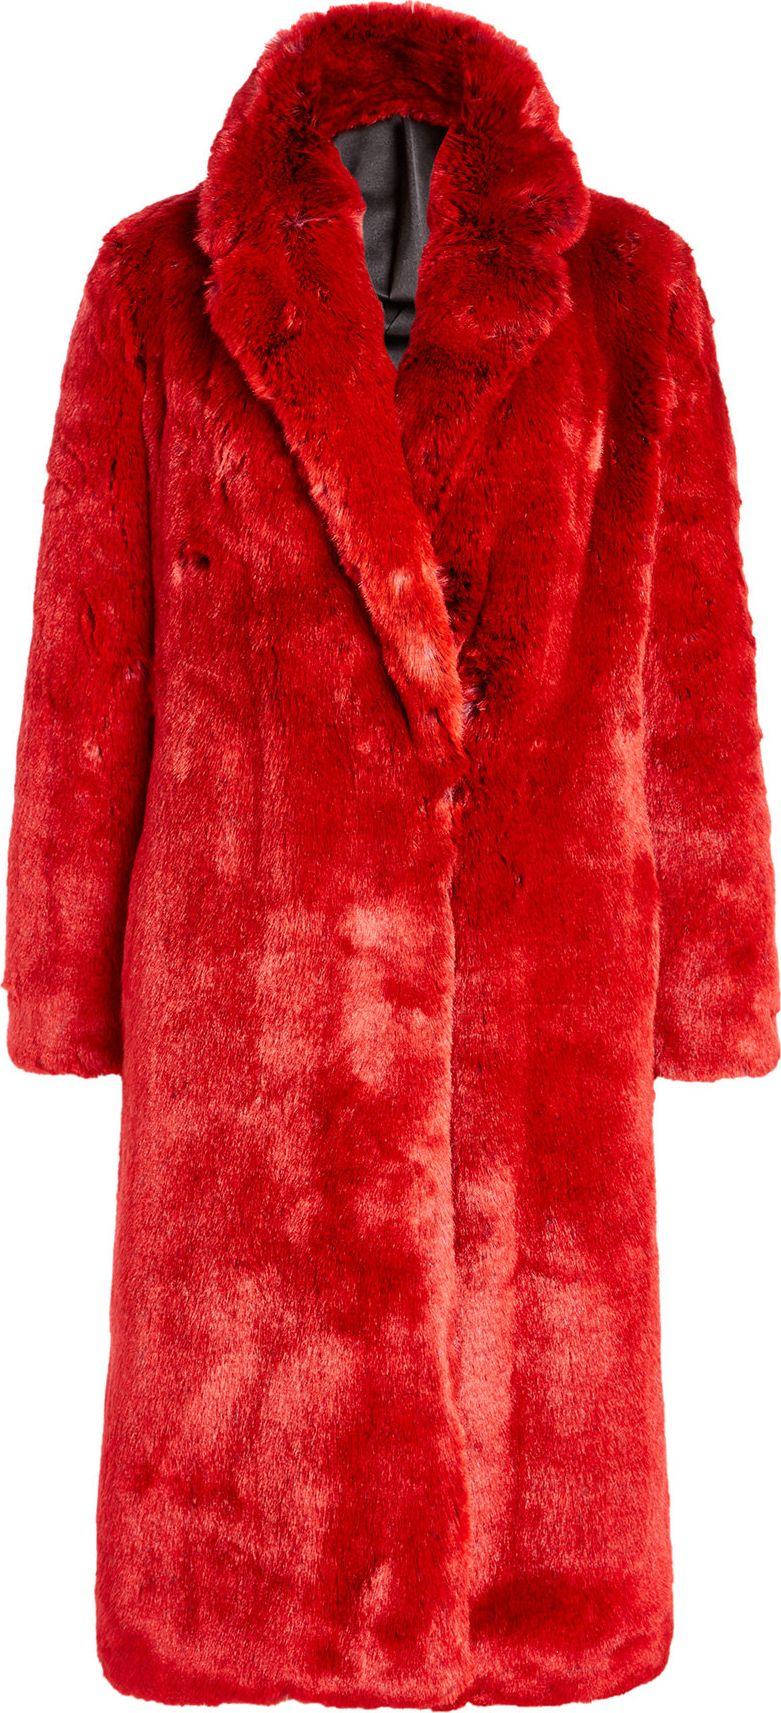 Calvin Klein 205W39NYC - Faux Fur Coat